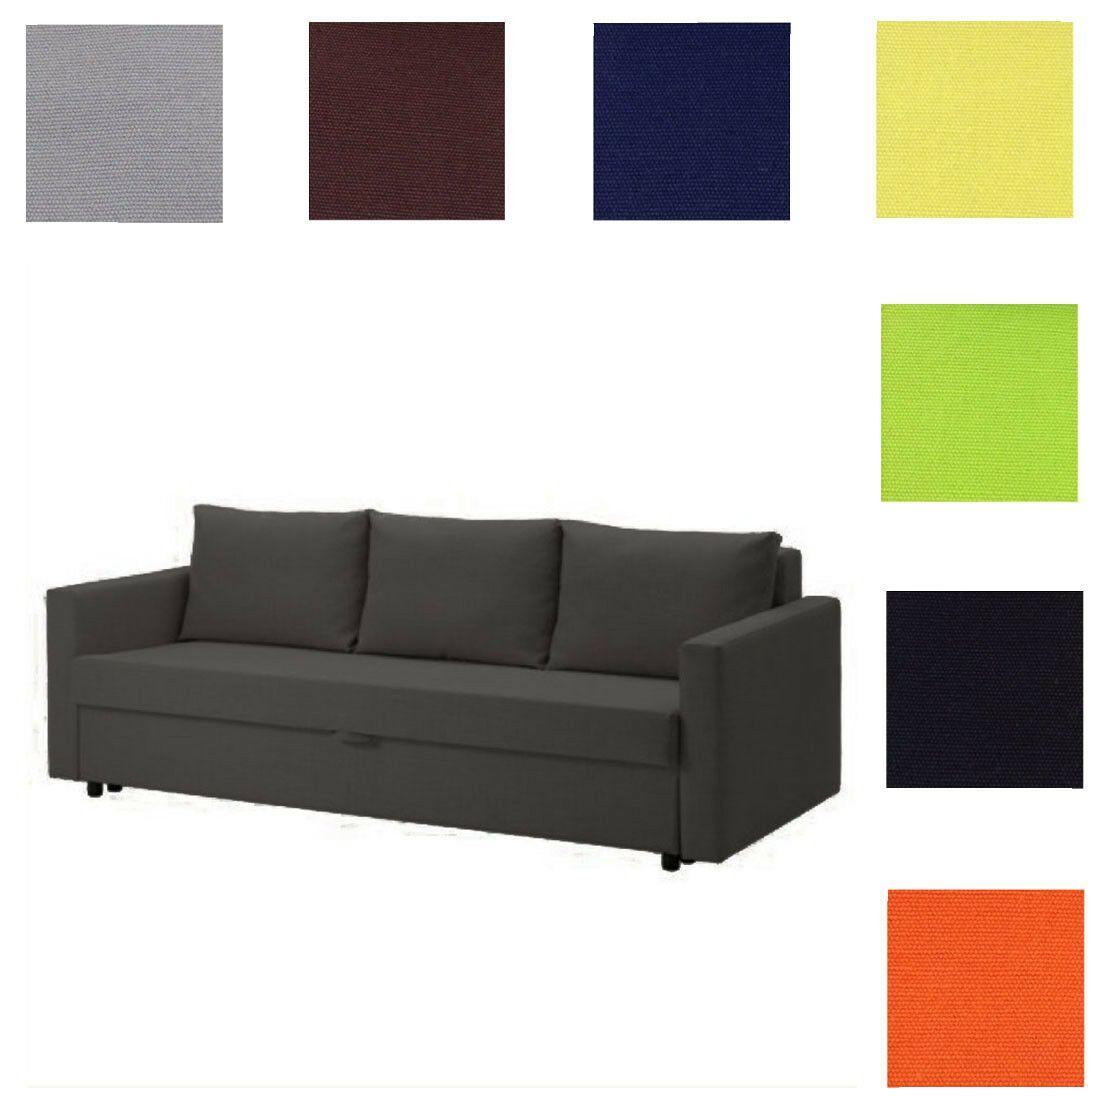 Custom Made Cover Fits Ikea Friheten Sofa Bed Three Seat Sleeper Ikea Sofa Ideas Of Ikea Sofa Sofa Ikea Bed Covers Ikea Friheten Sofa Bed Friheten Sofa